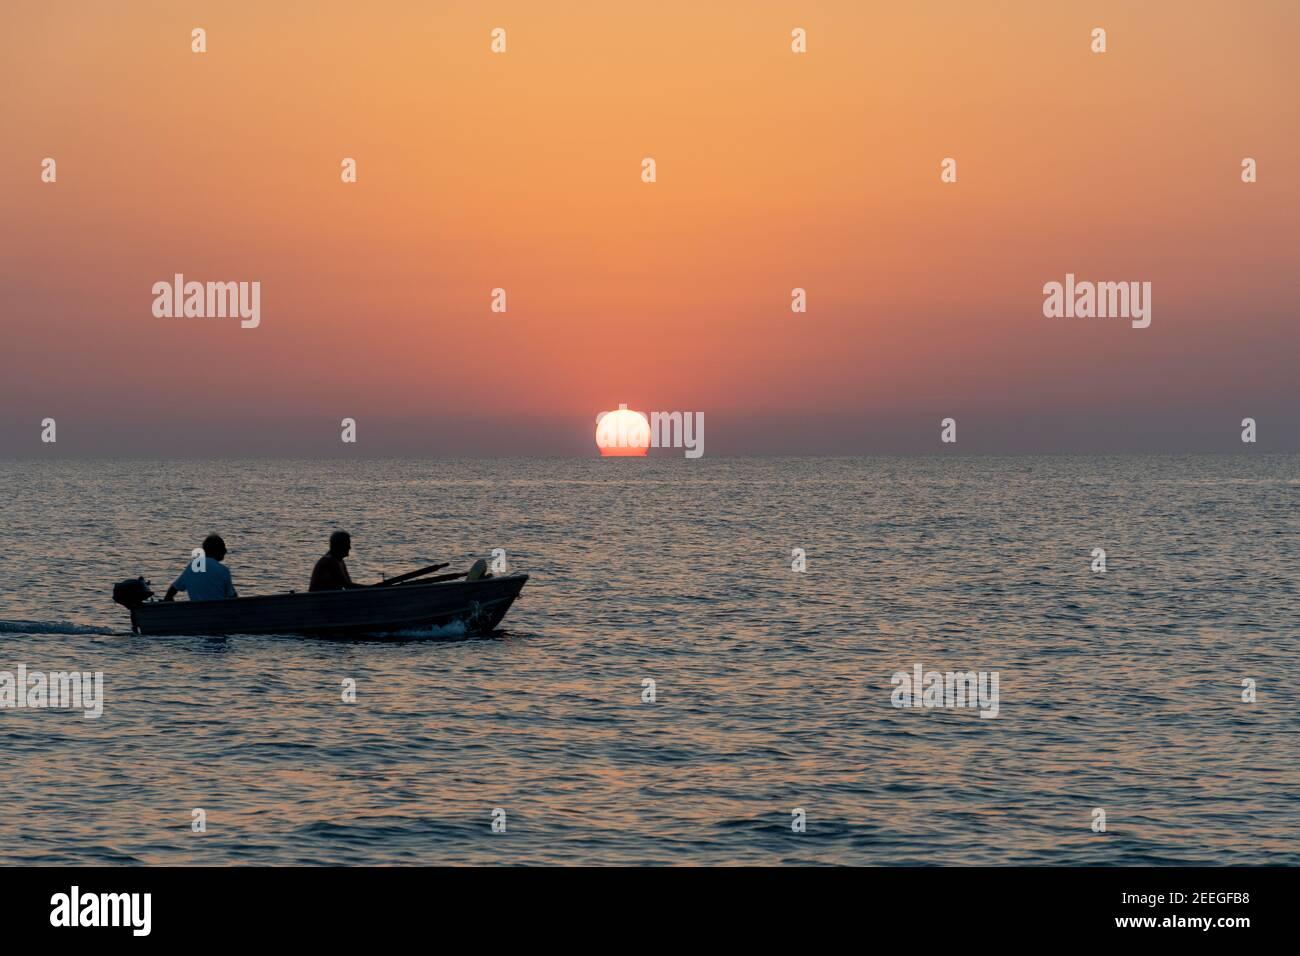 landscape - sunset on the coast, waves, horizon. top view. Stock Photo